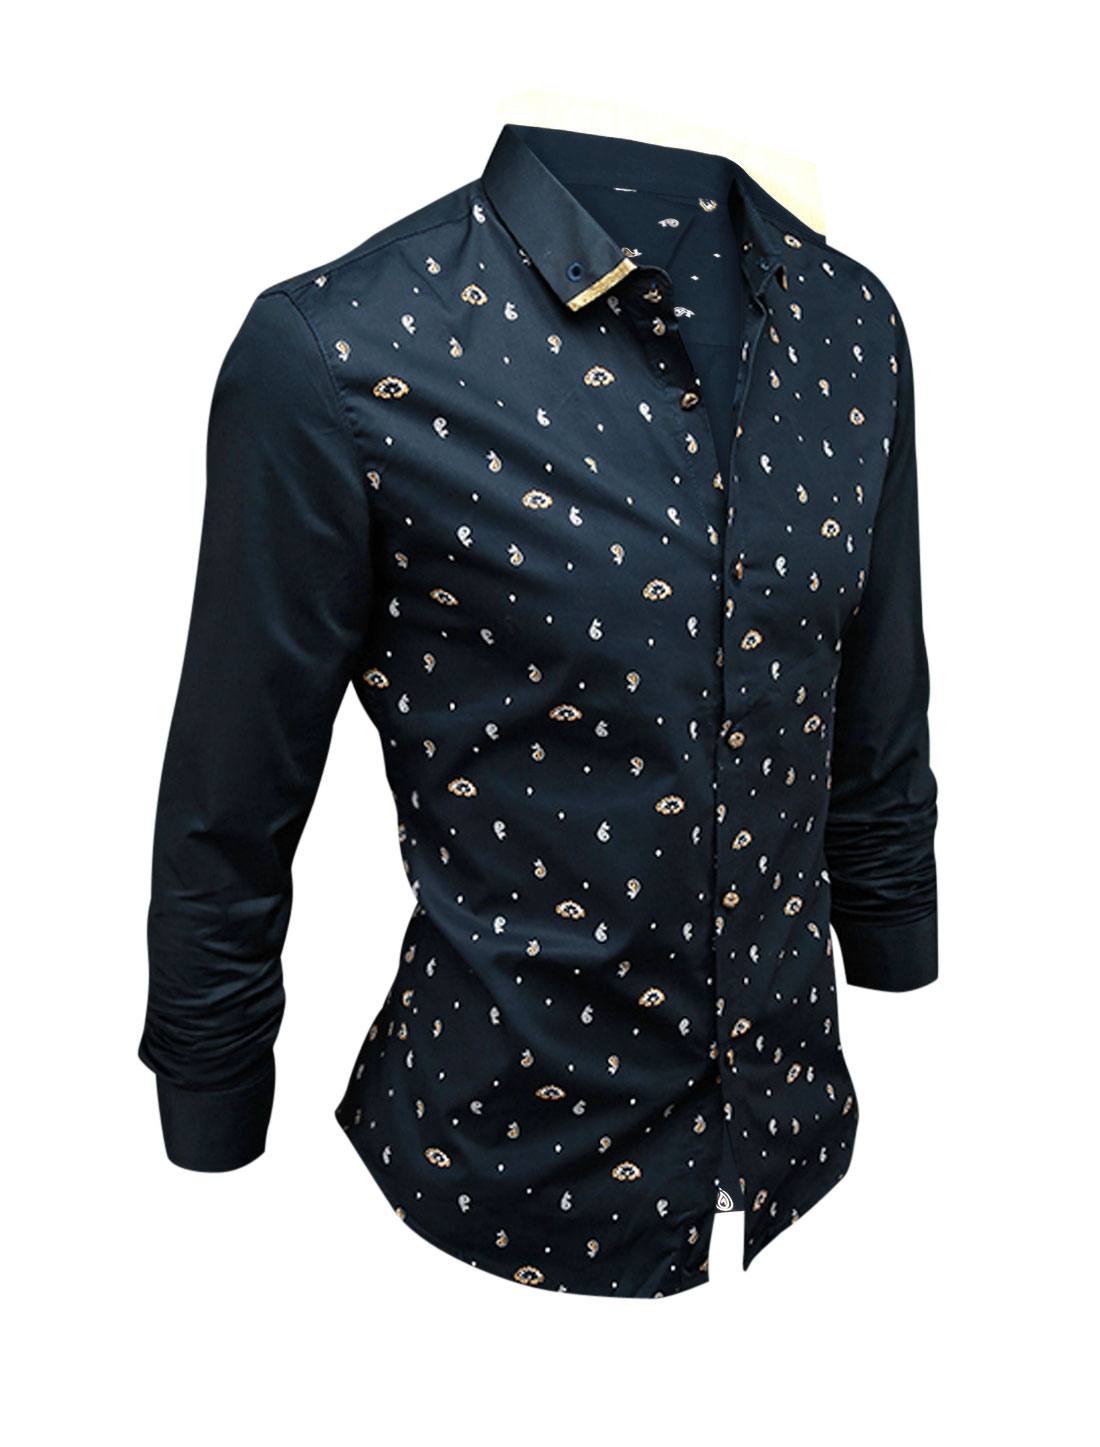 Man Navy Blue Button Closure Paisleys Pattern Button Cuffs Slim Fit Shirt S